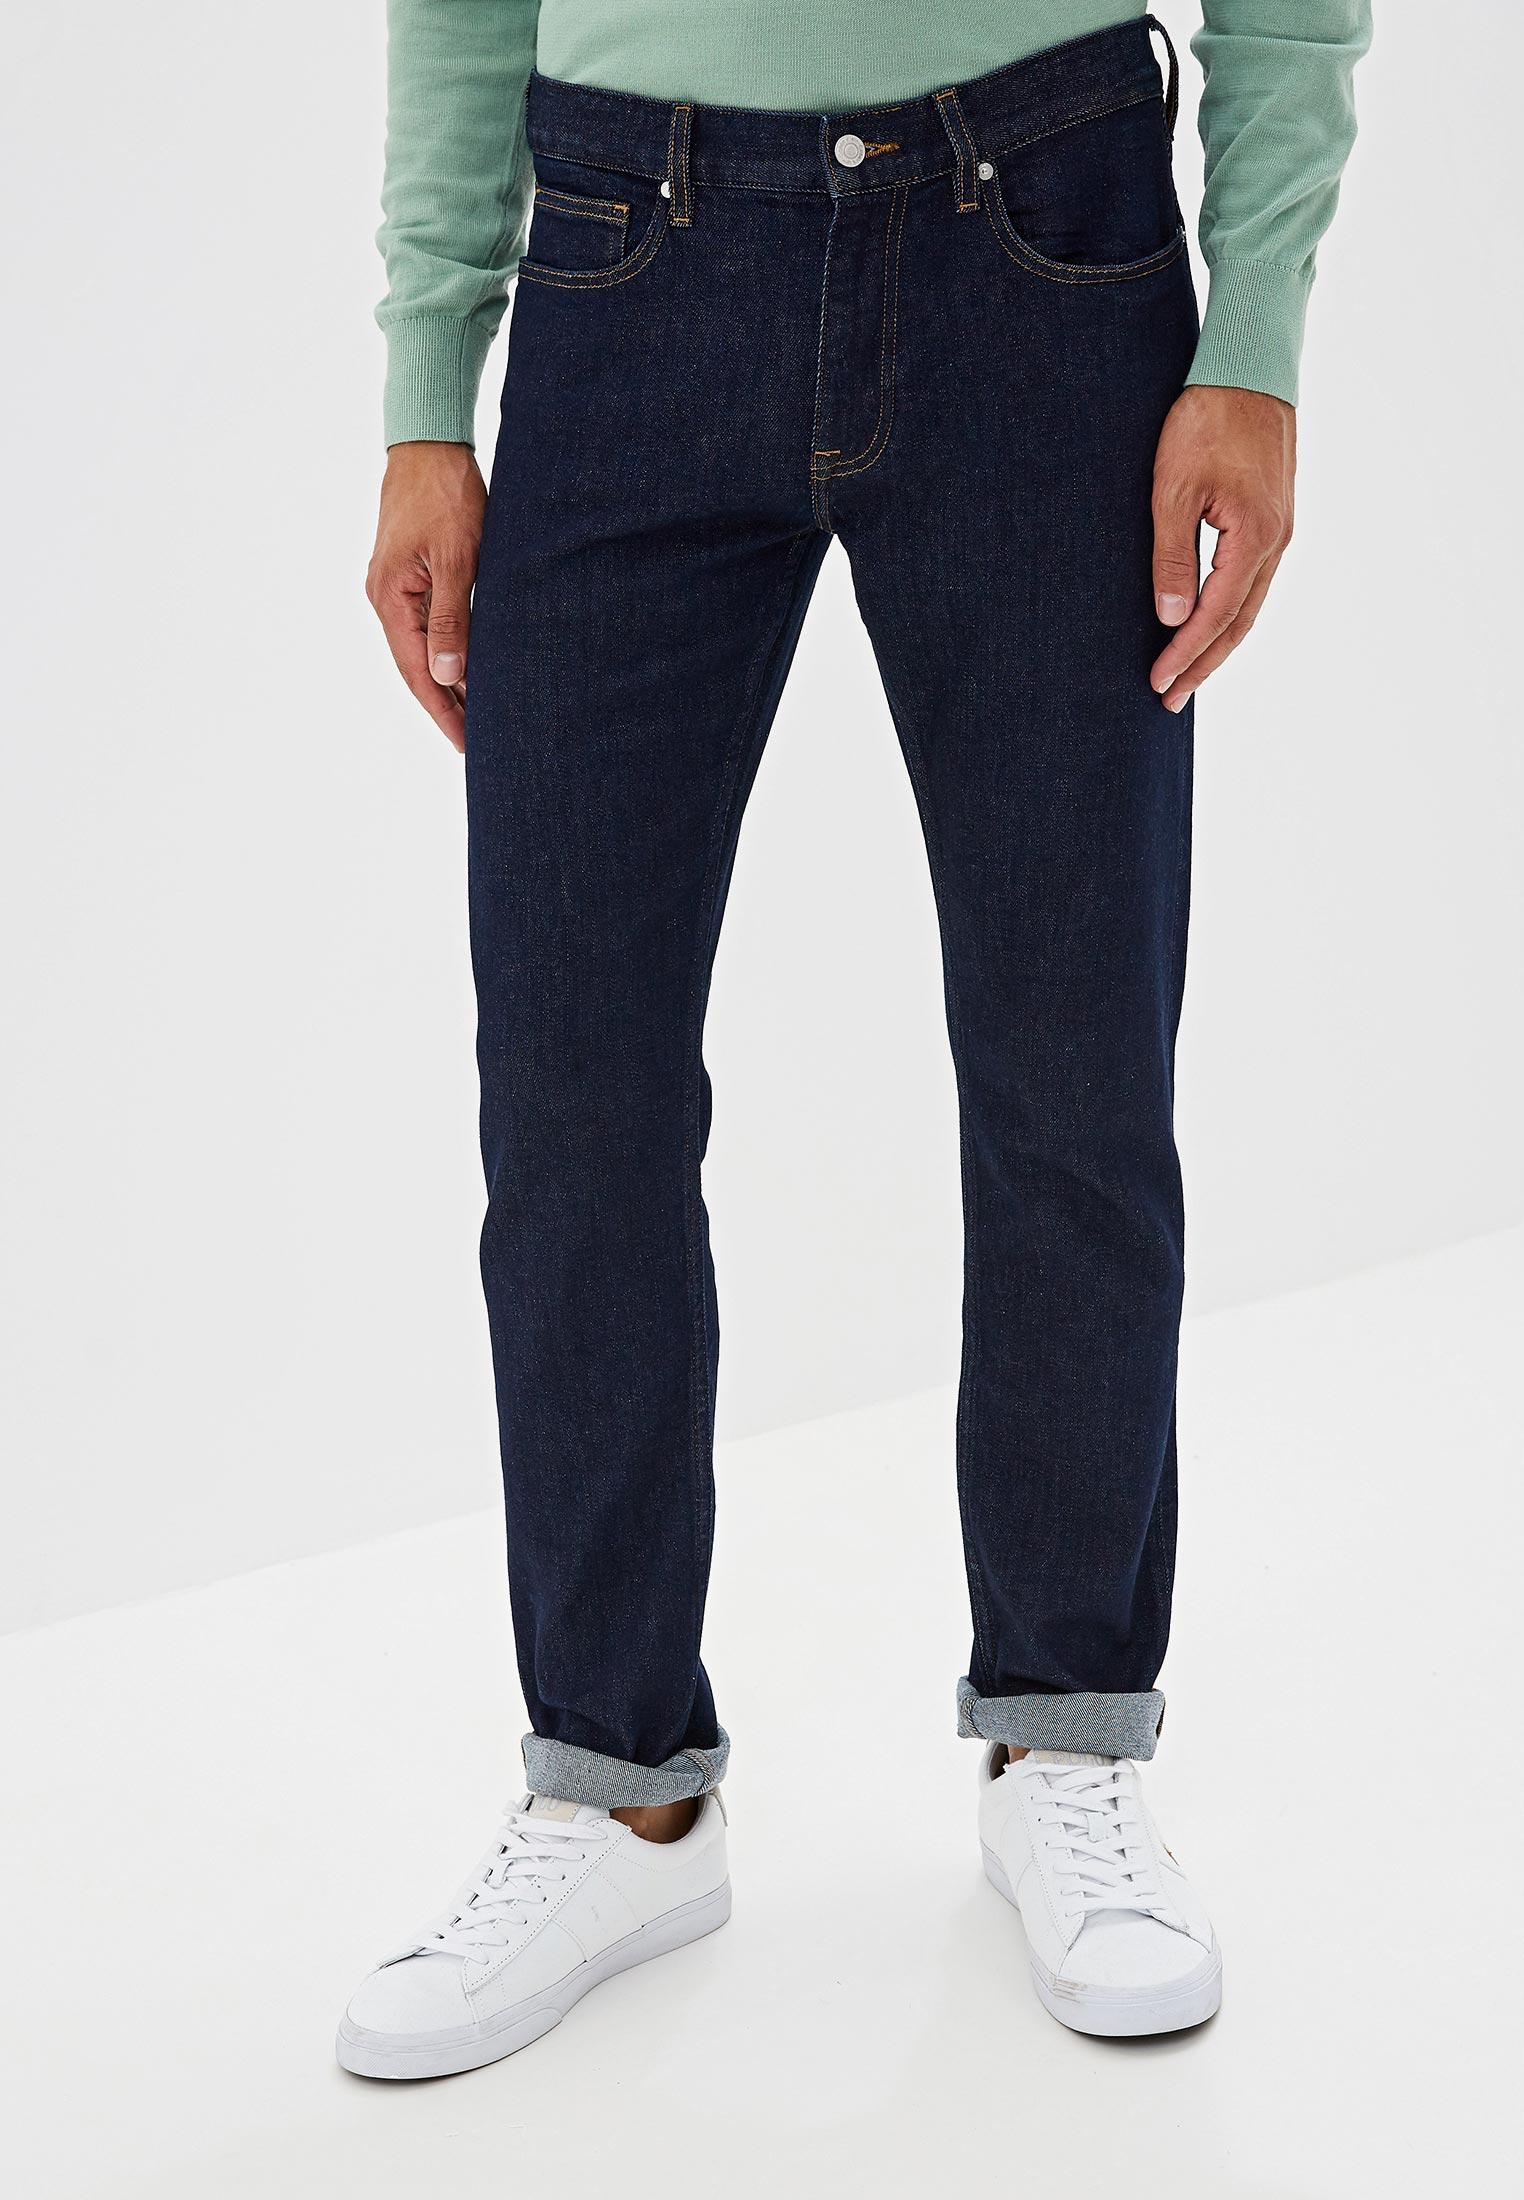 Зауженные джинсы Calvin Klein (Кельвин Кляйн) k10k104359